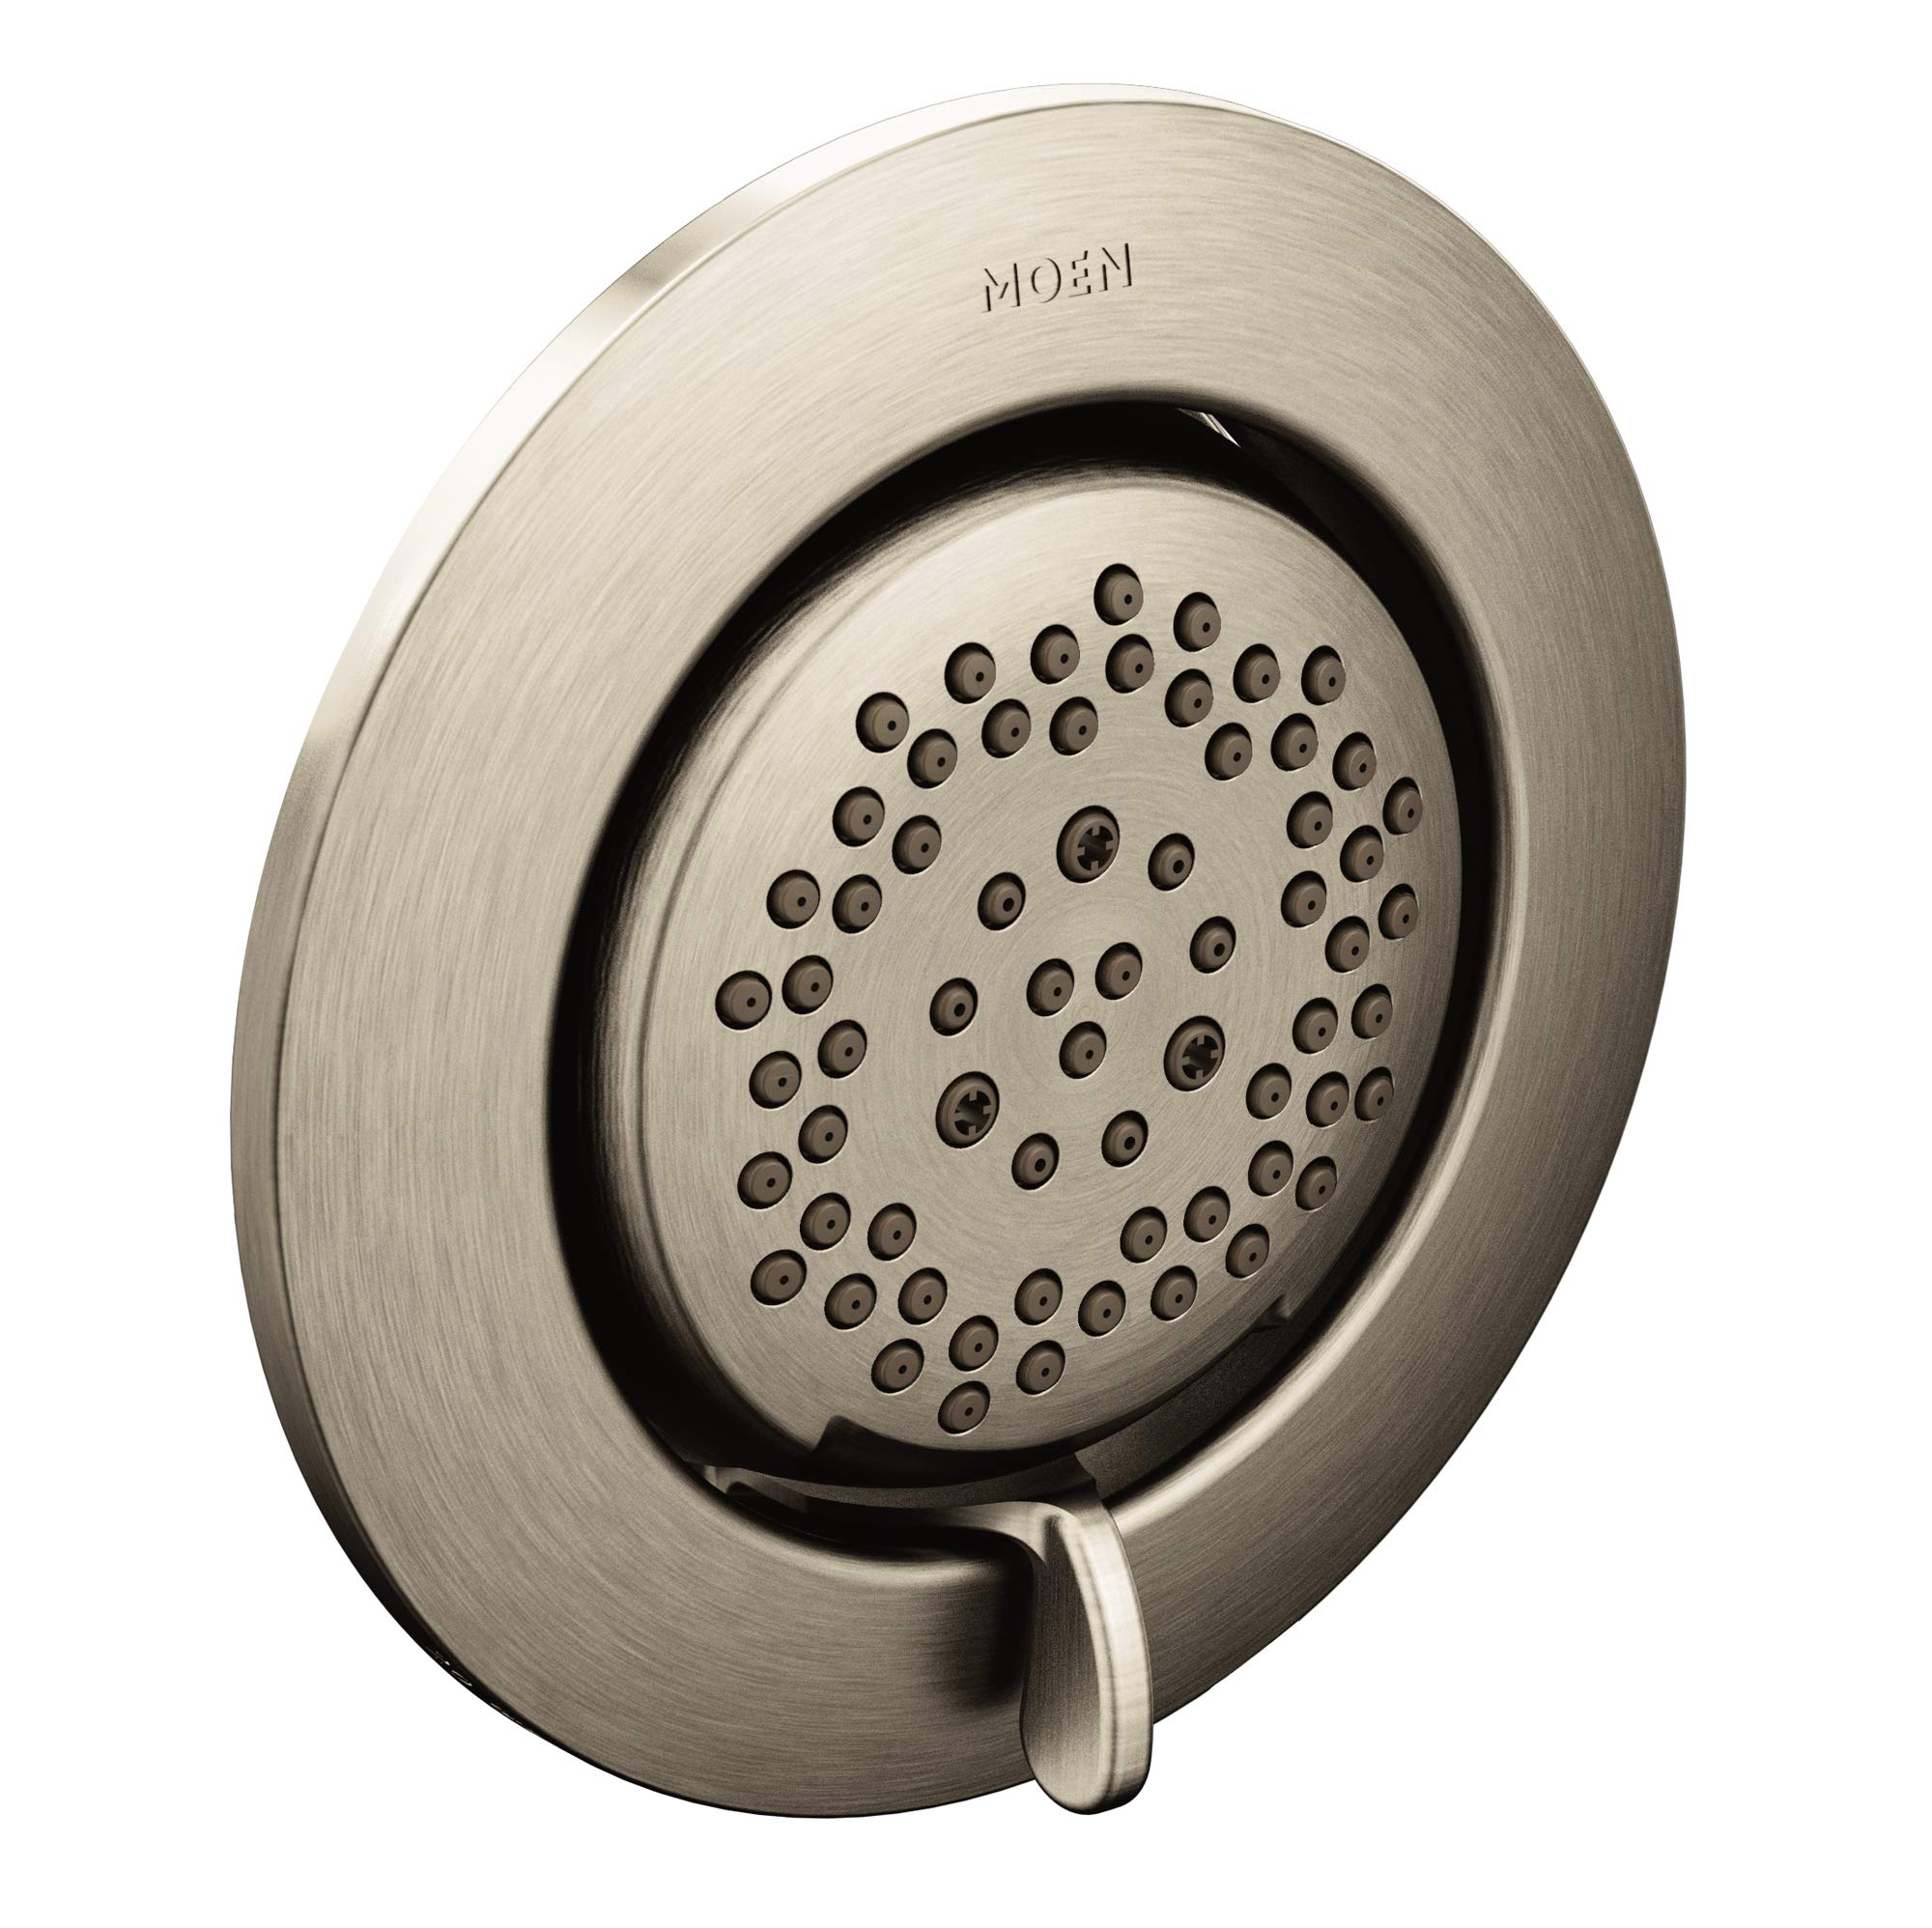 Moen TS1422BN Mosaic Two-Function 3-1/4 Inch Diameter Head Body Spray, Brushed Nickel